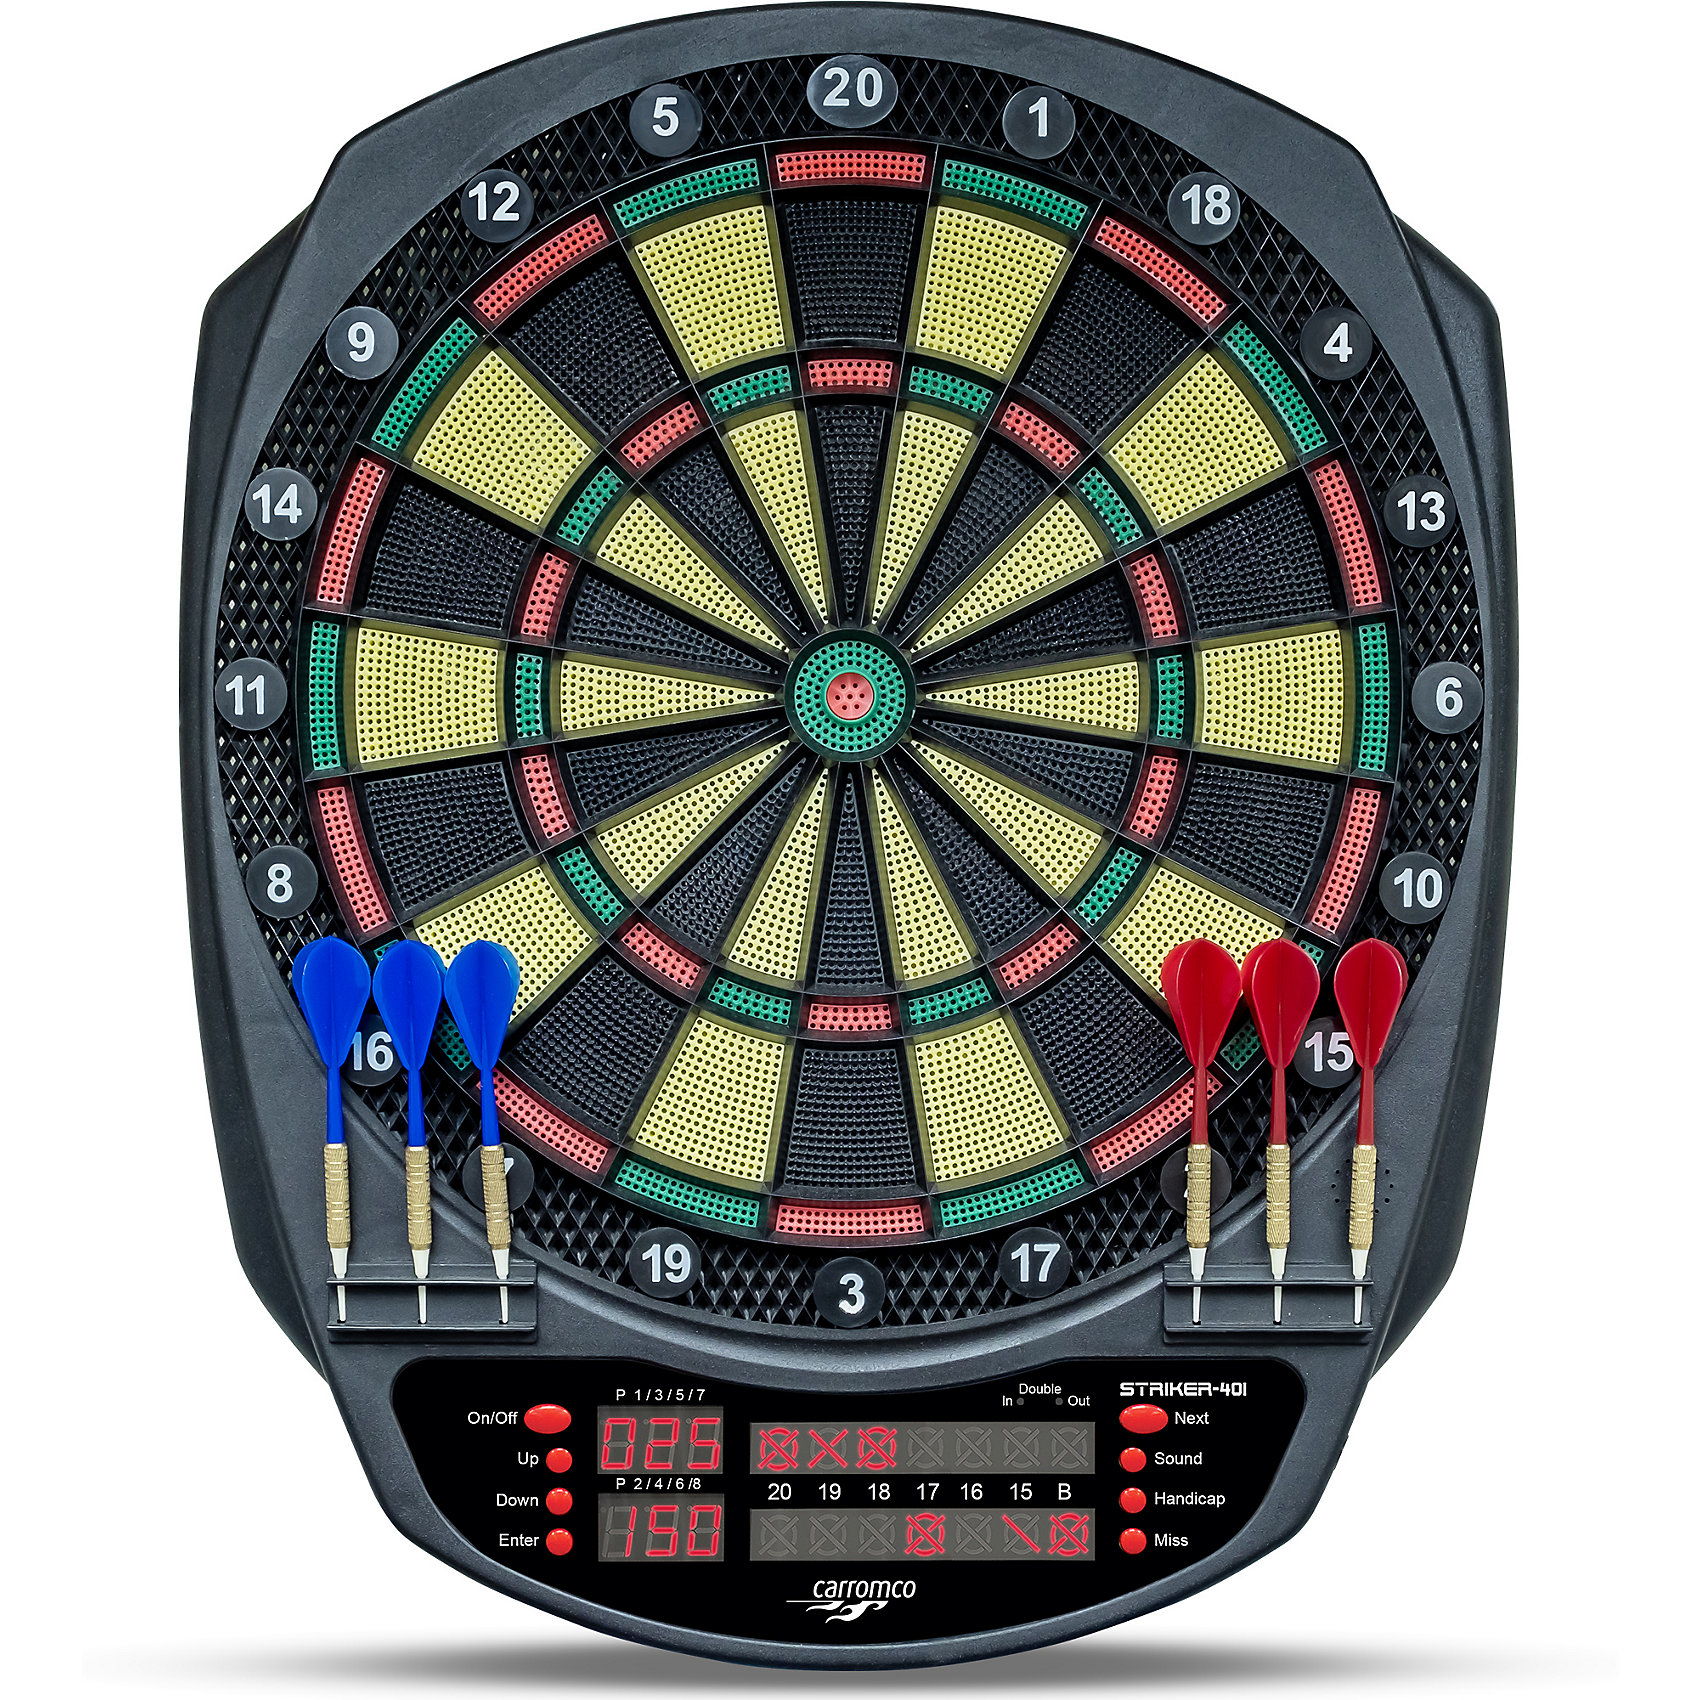 Carromco Elektronik dartboard Abstand Striker-401, mit Adapter, 3-Loch Abstand dartboard 6664287 a8e8da